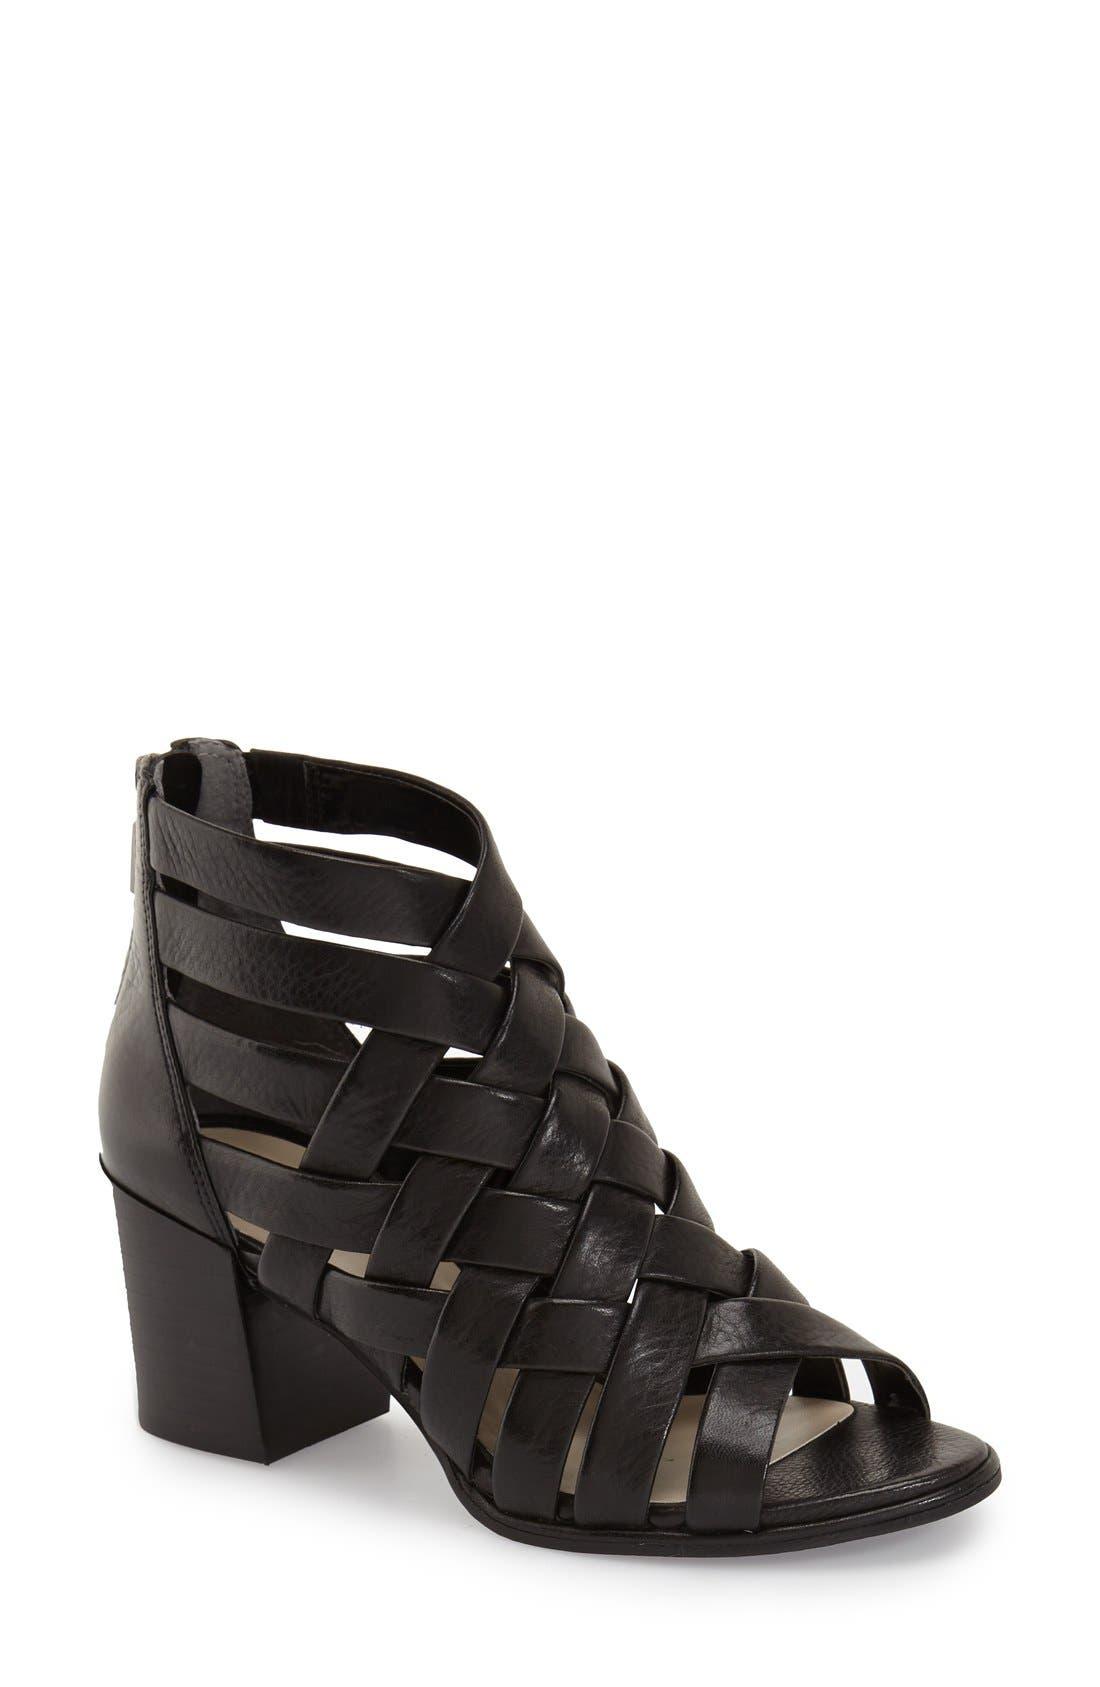 'Charlene' Sandal,                         Main,                         color, Black